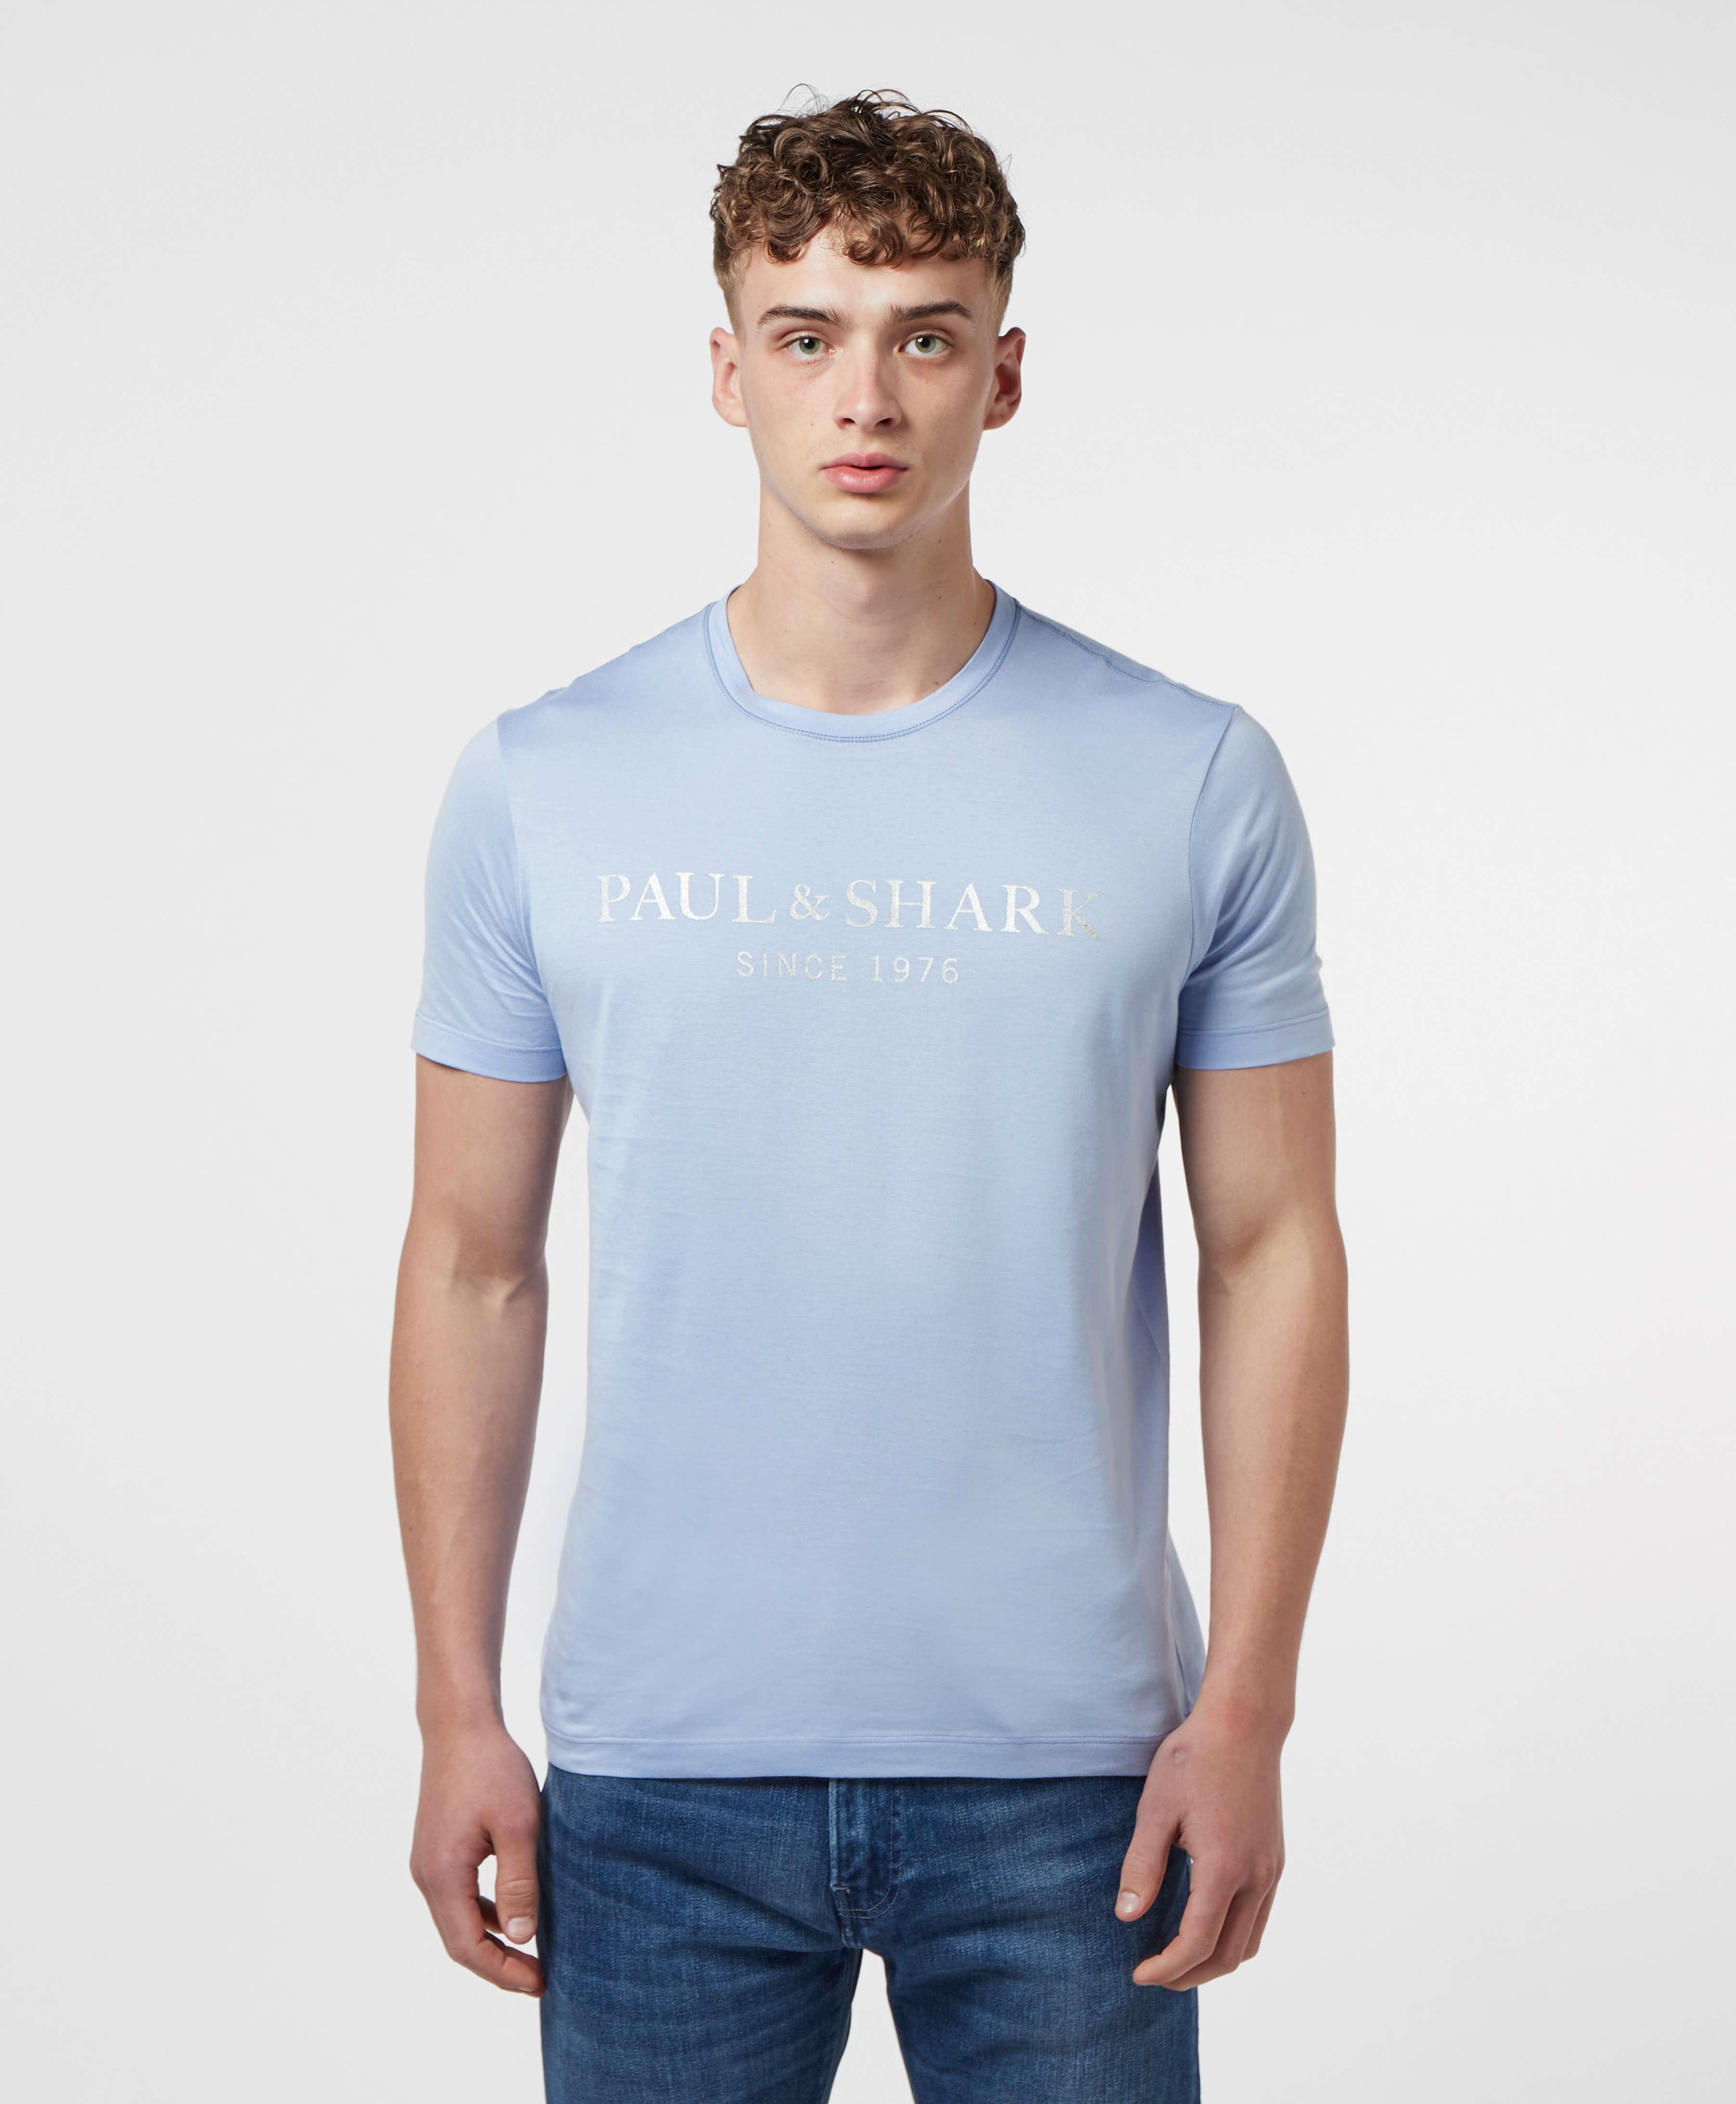 Paul and Shark Silver Logo Short Sleeve T-Shirt